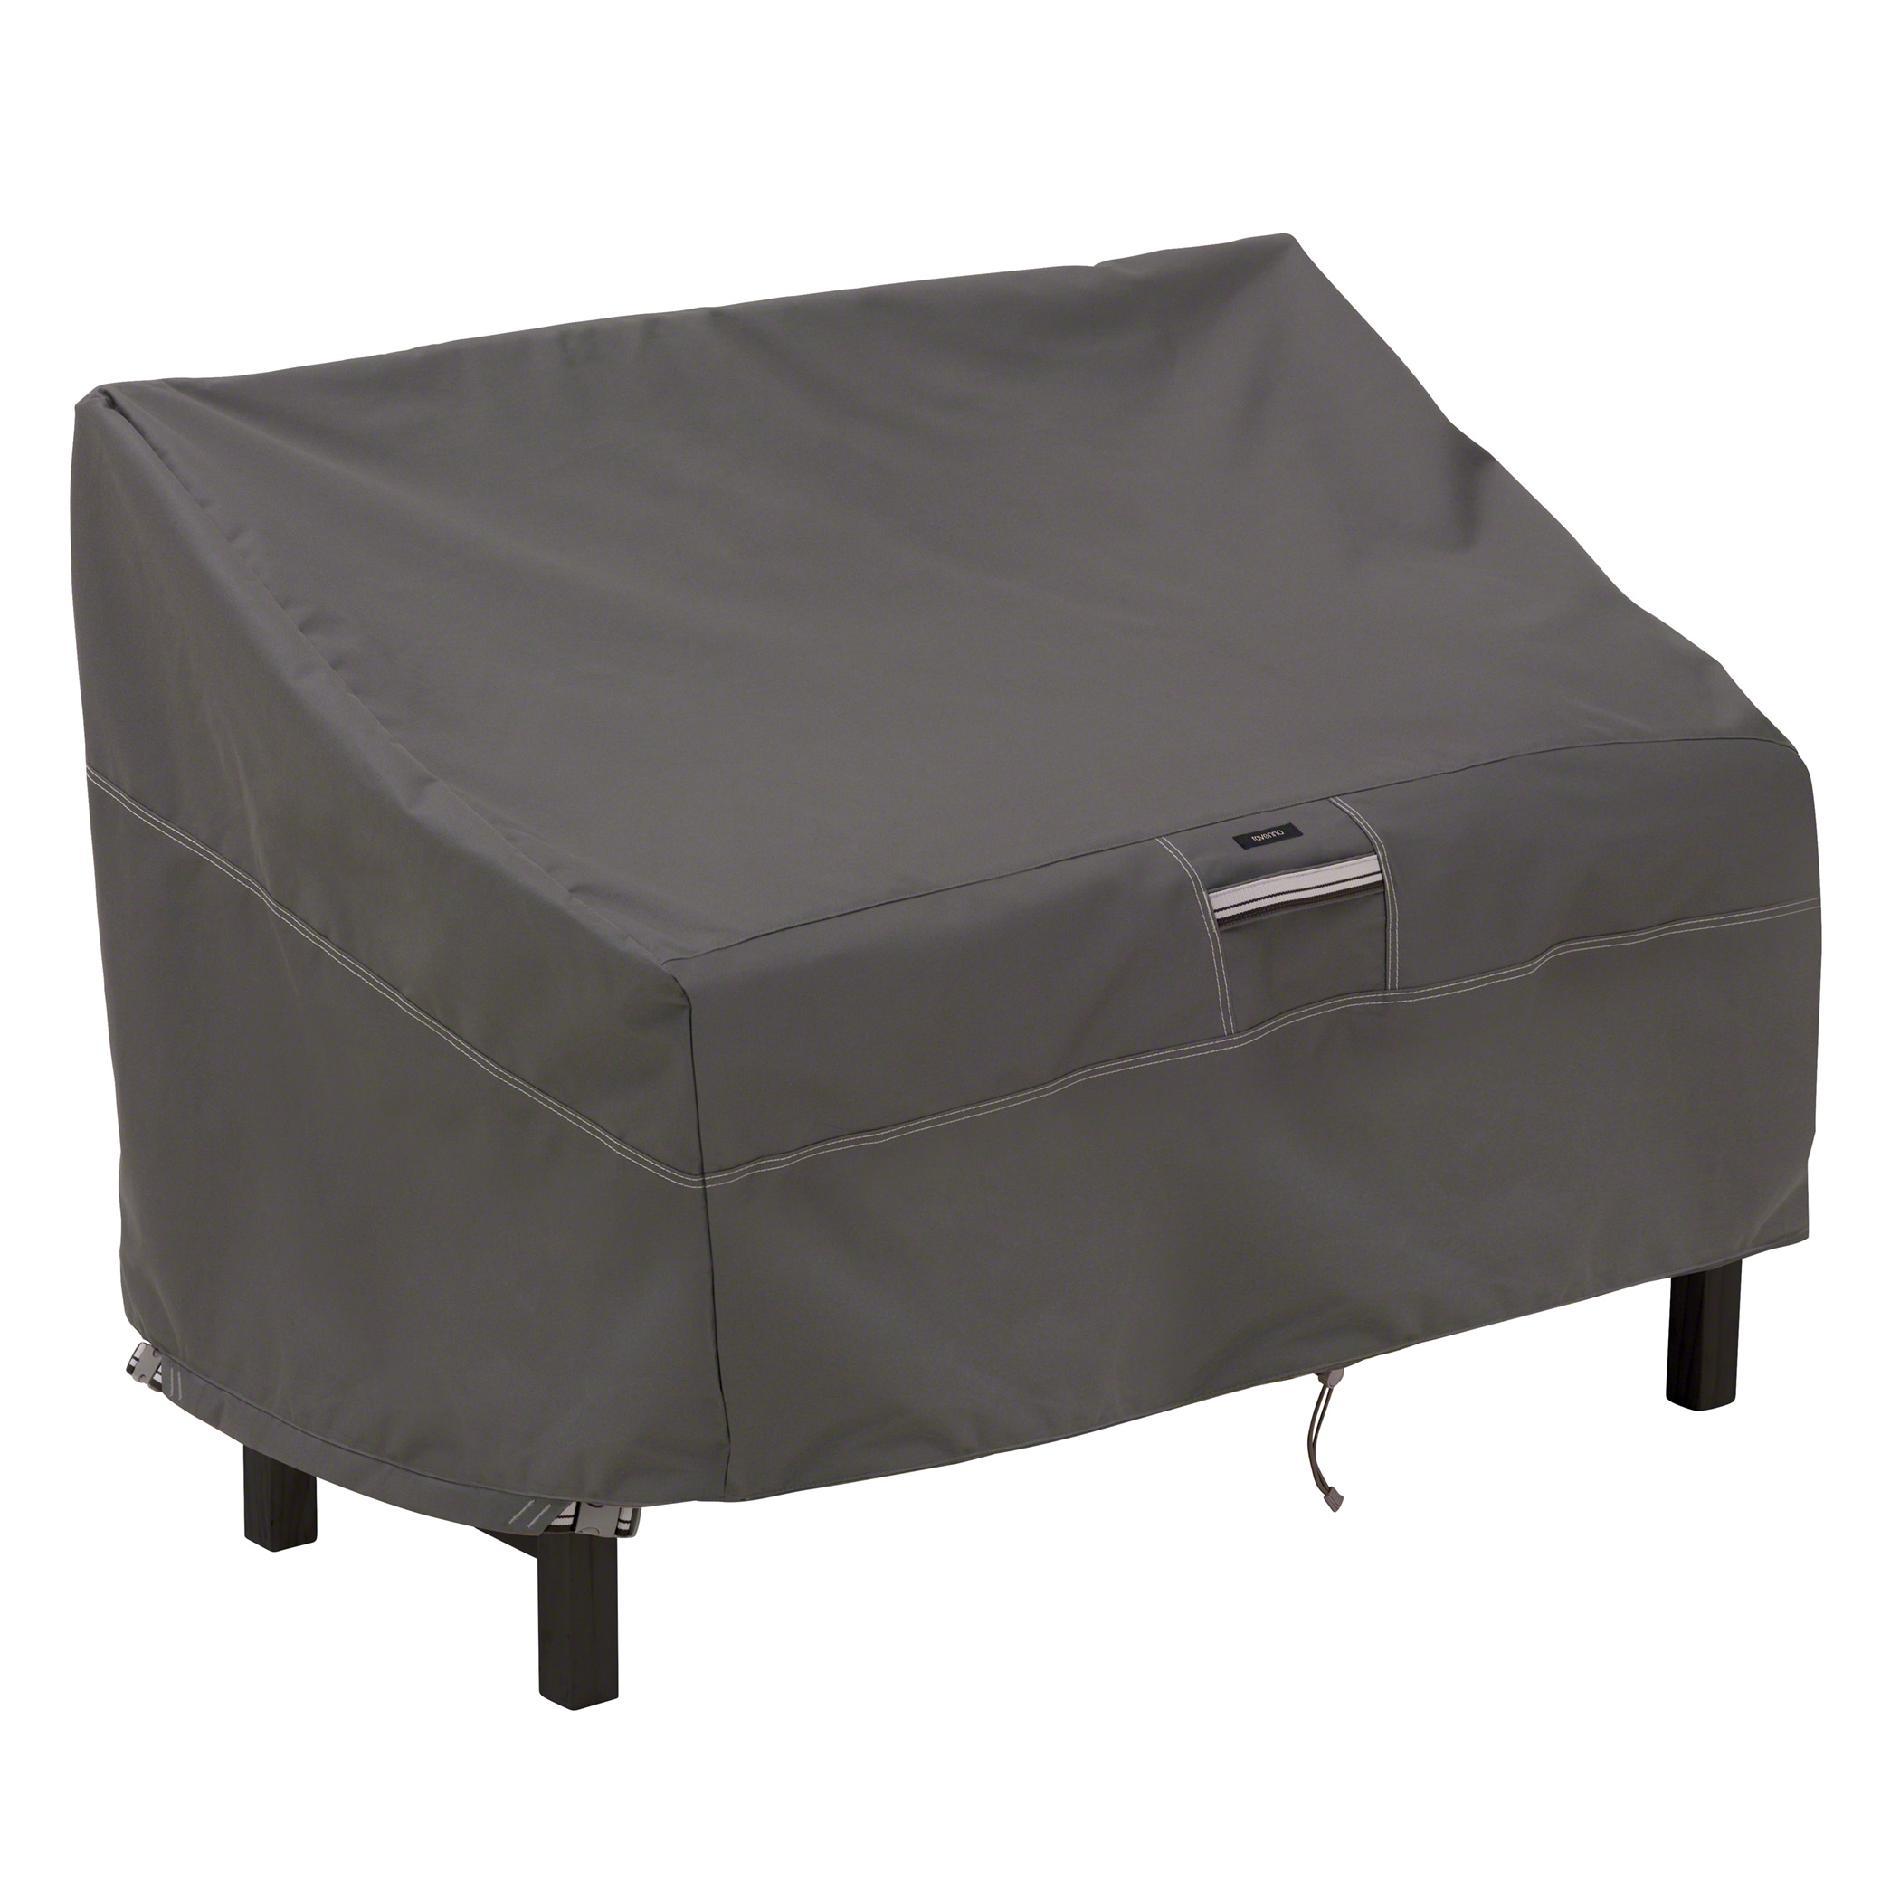 sears patio chair covers xxl fuf waterproof get outdoor